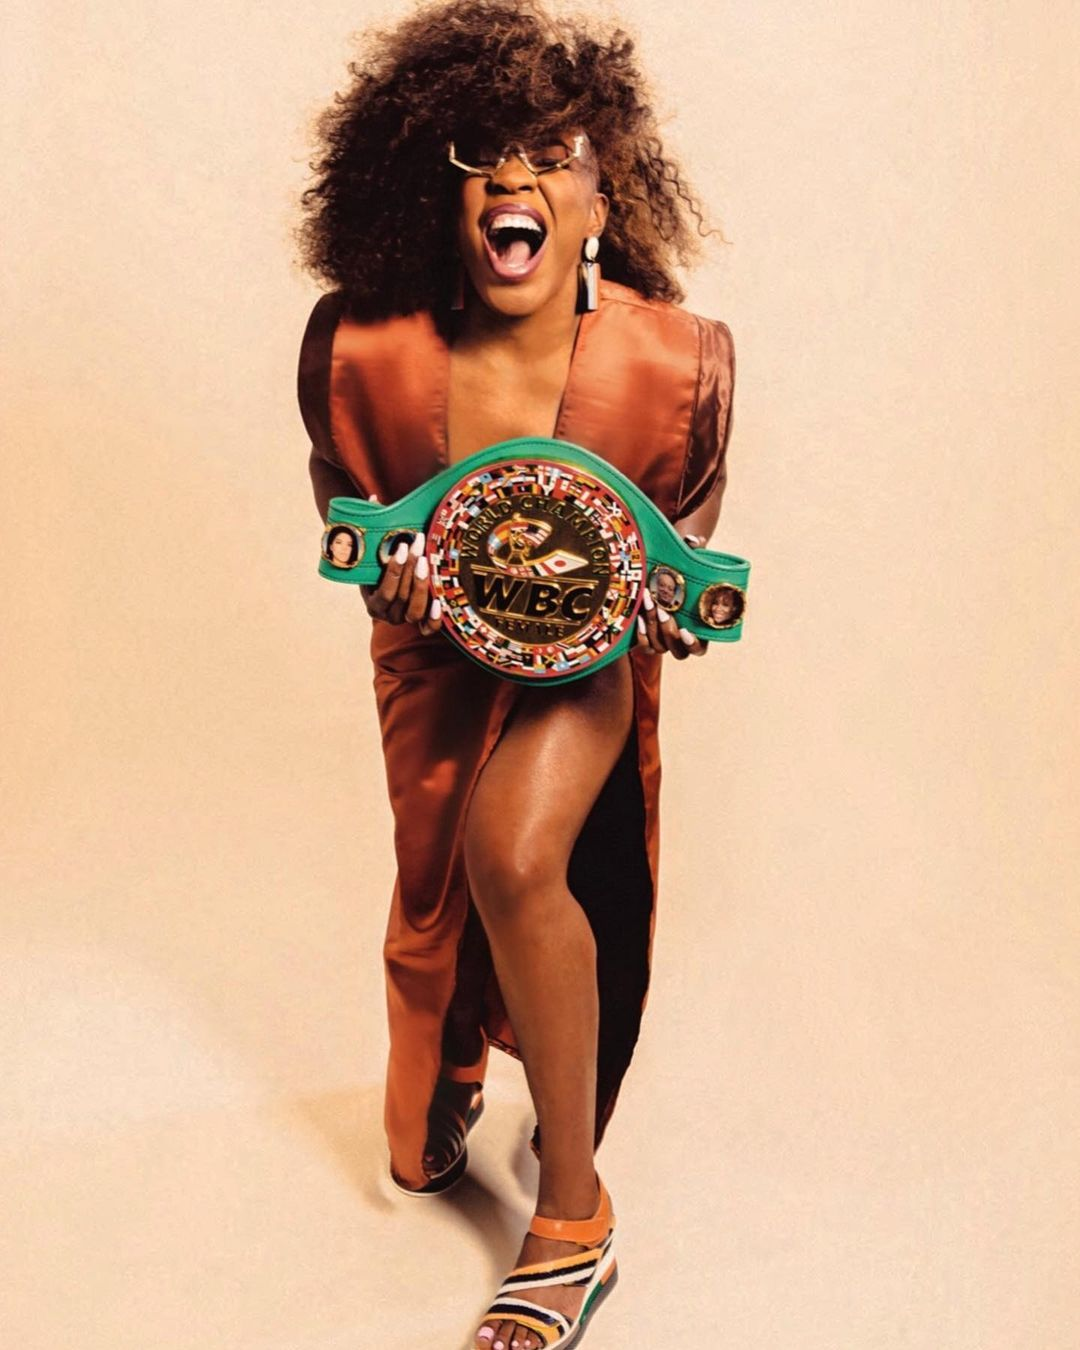 Profile of WBC Super Middleweight Champion, Franchon Crews-Dezurn | Boxen247.com